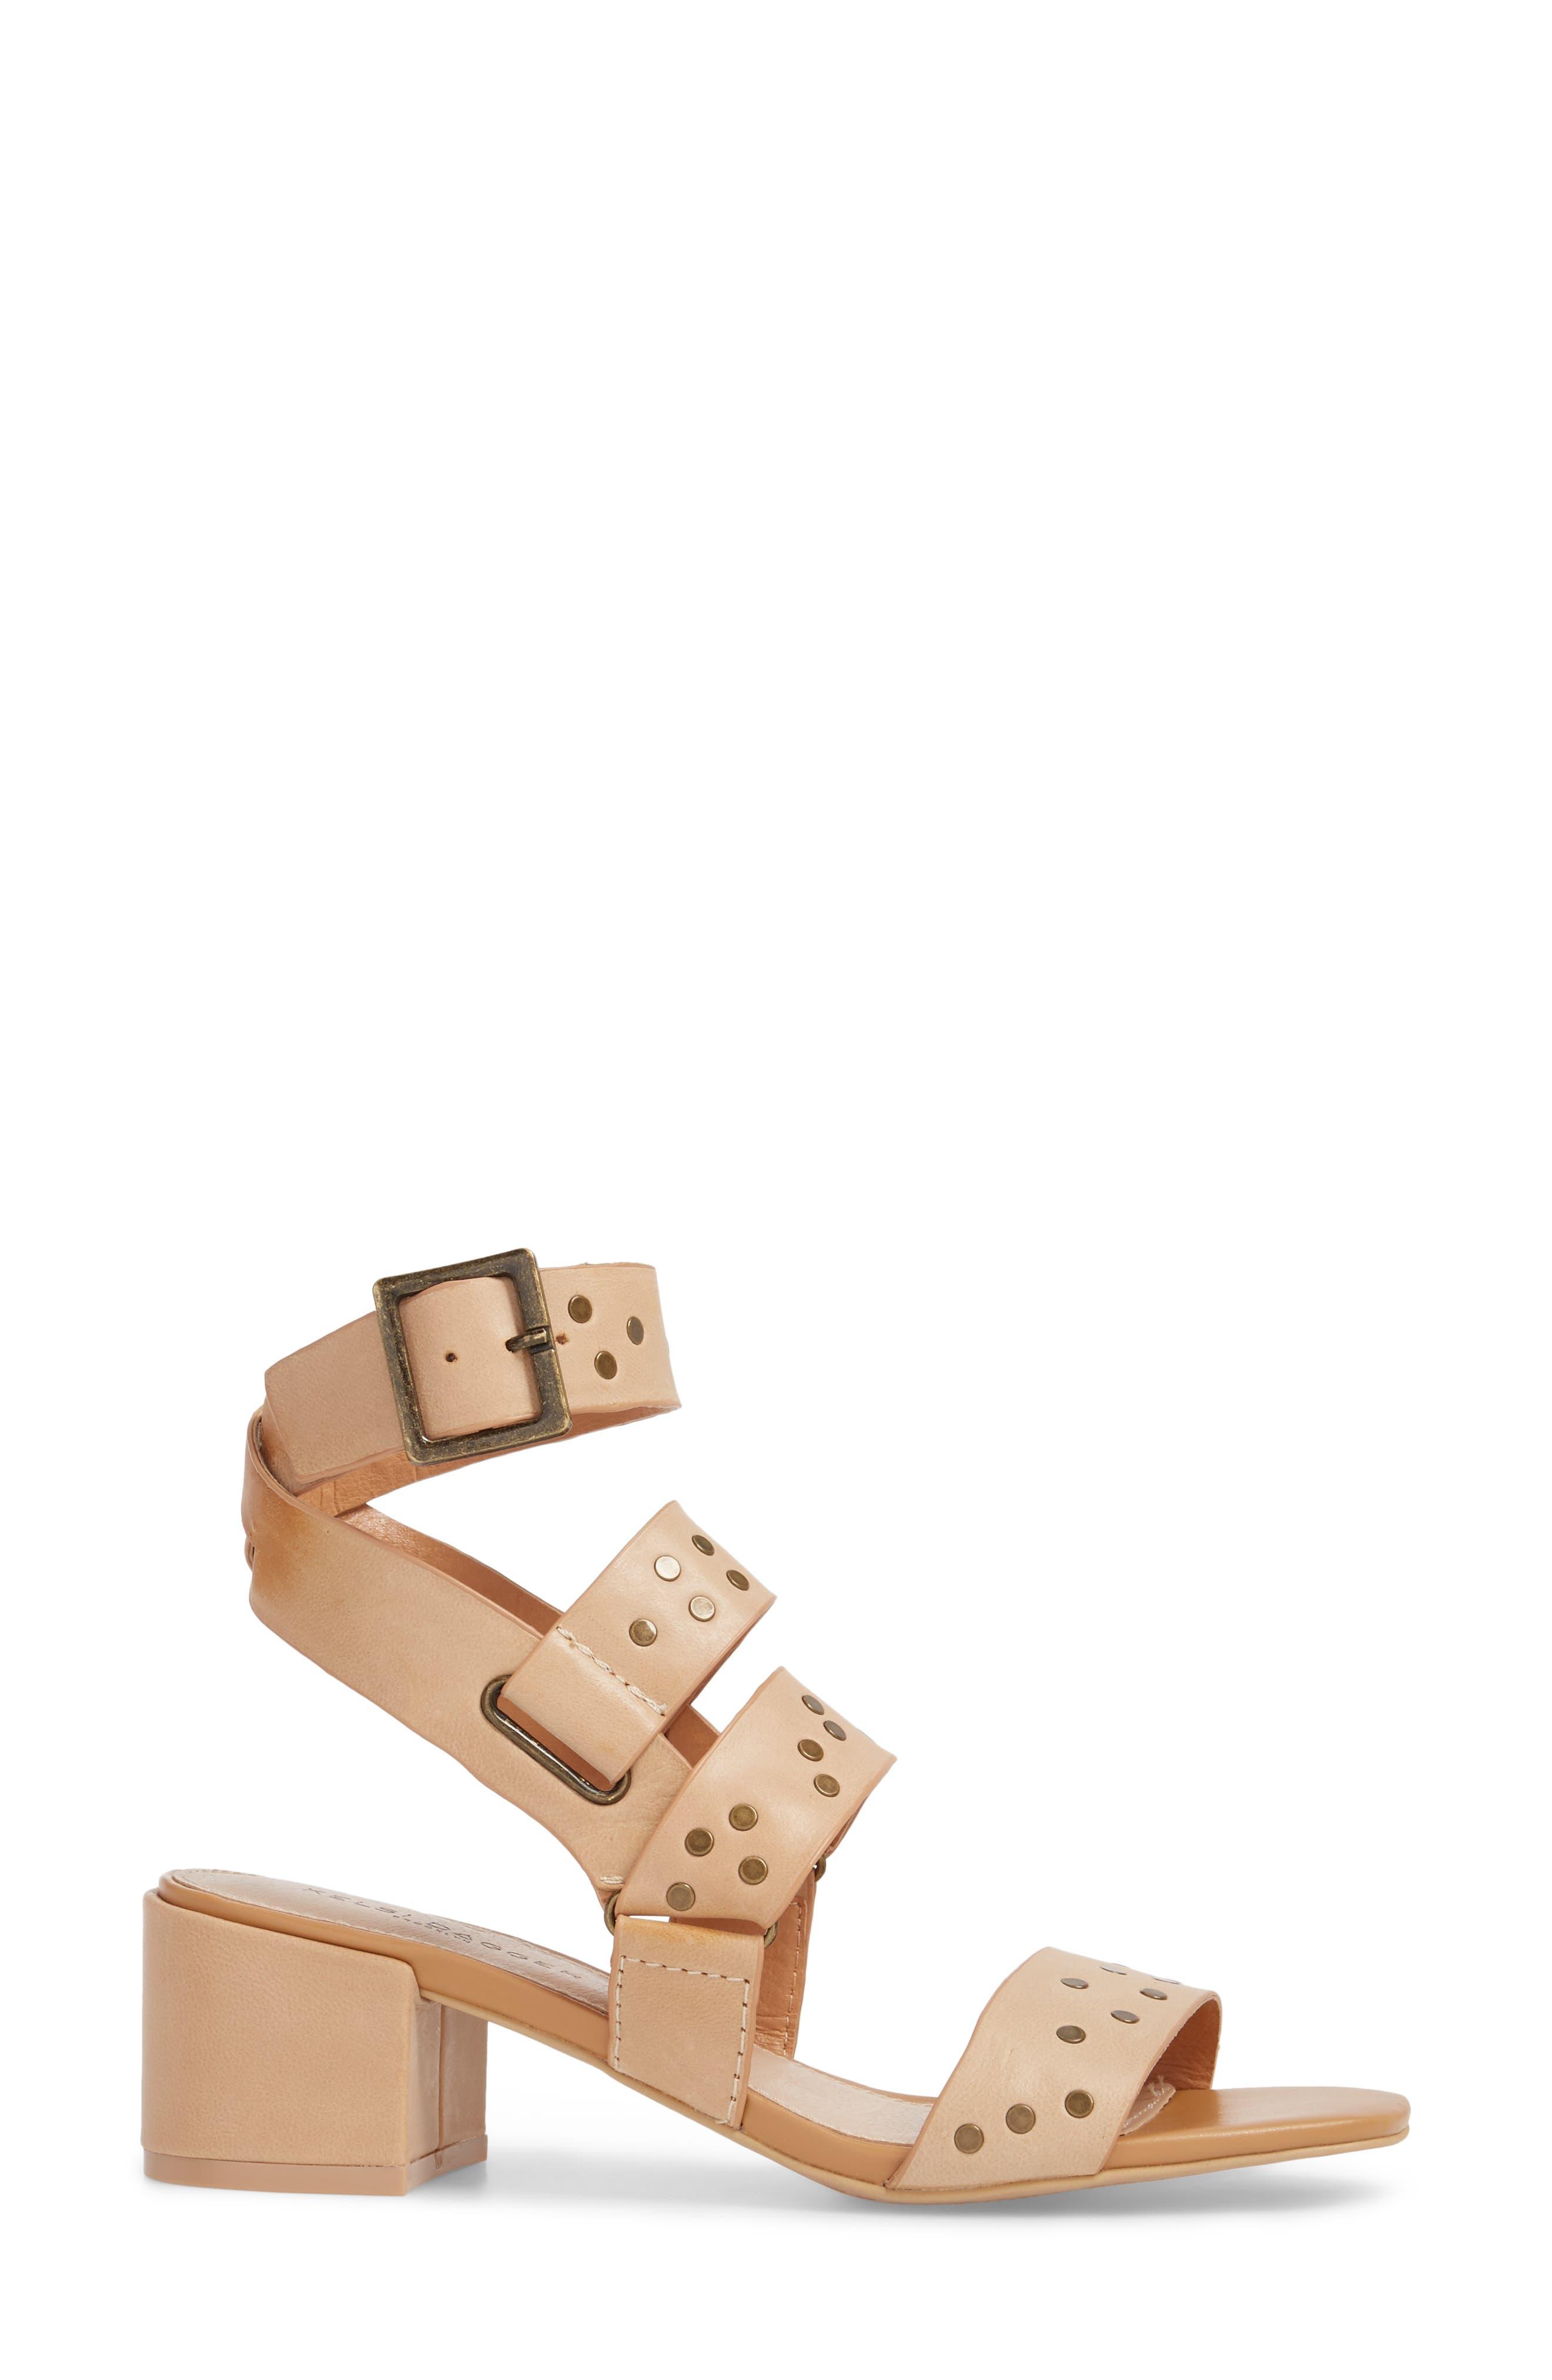 Seabring City Sandal,                             Alternate thumbnail 3, color,                             Tan Leather